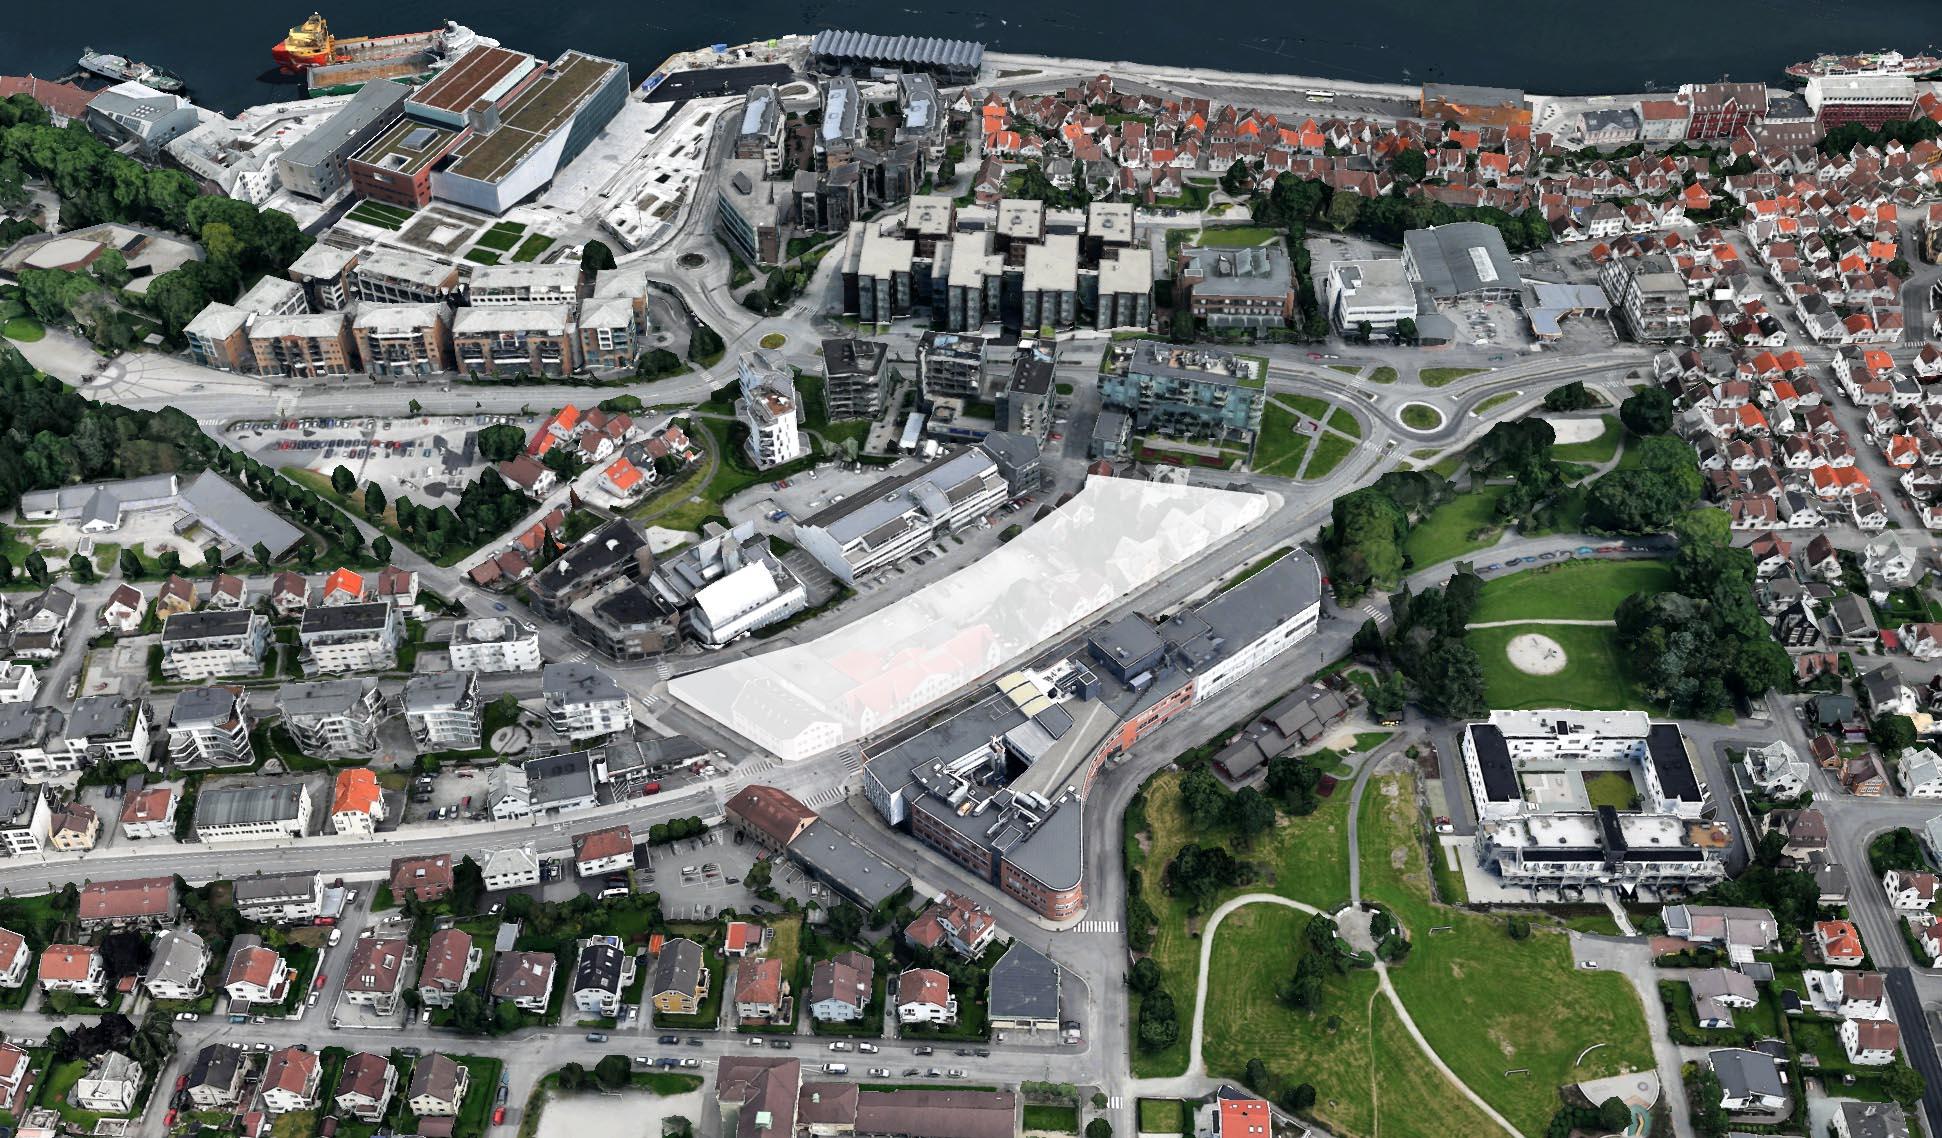 Sverdrups Gate